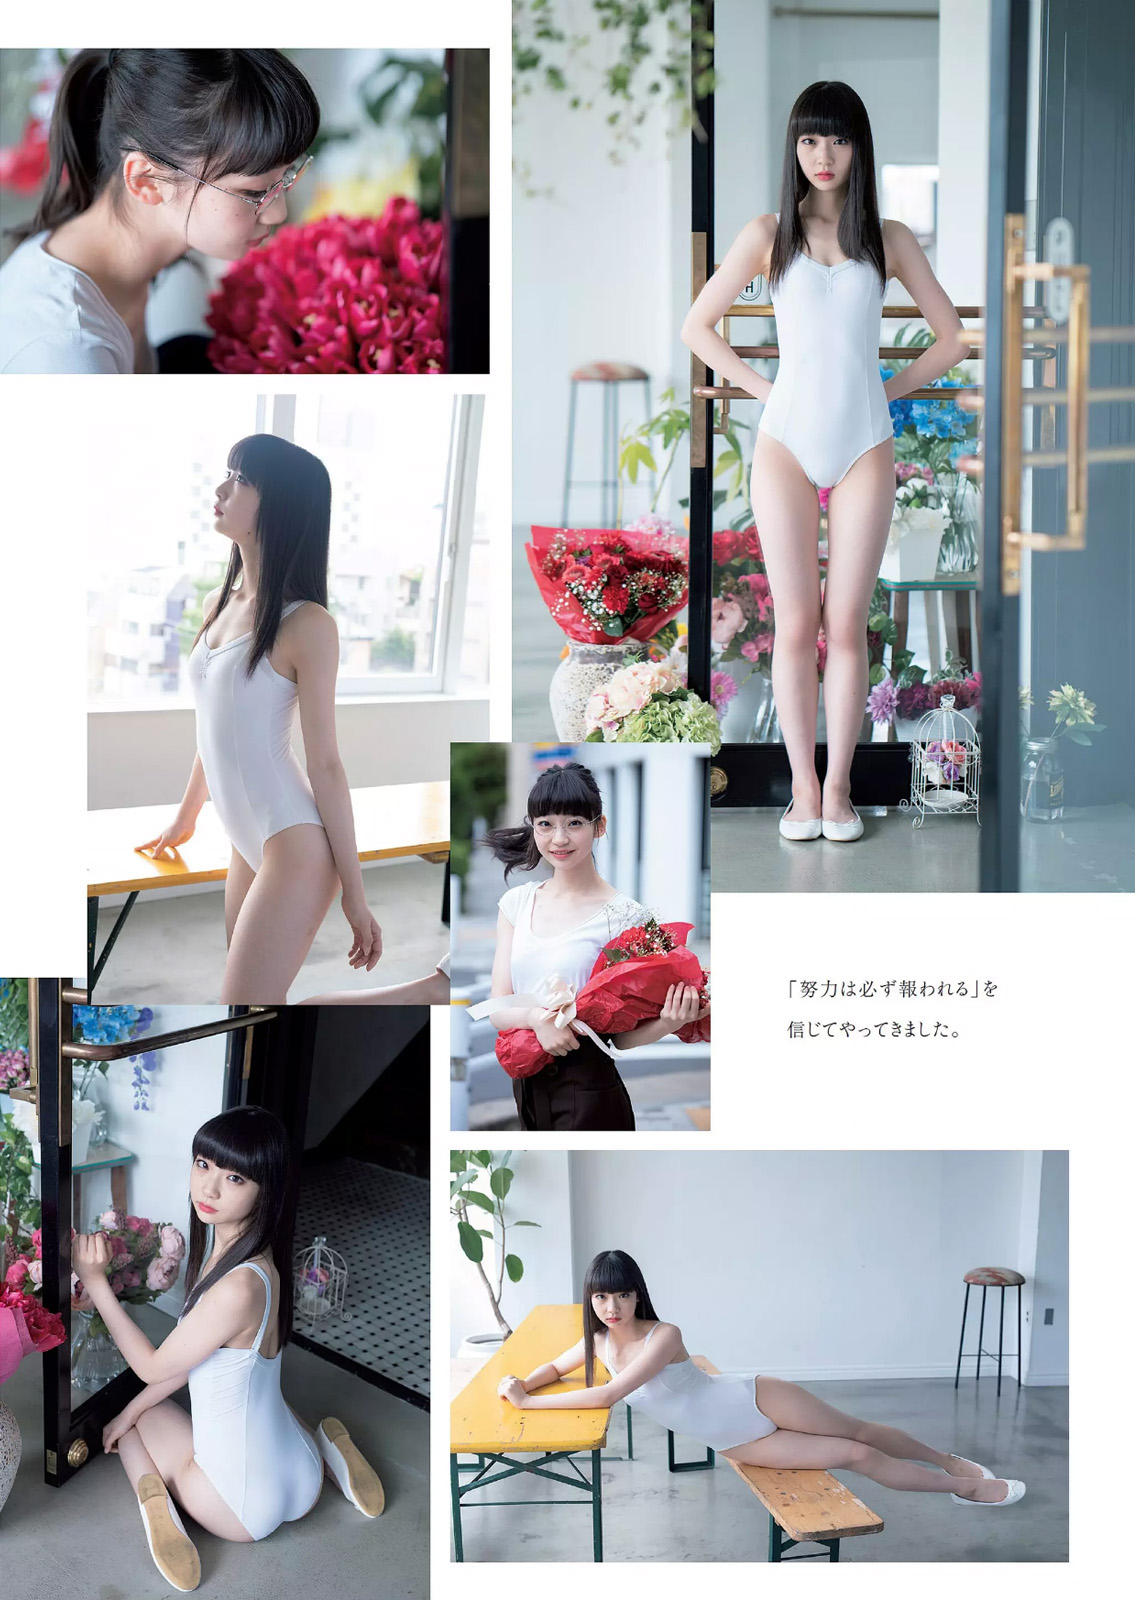 NGT48荻野由佳のアダルトエロ画像